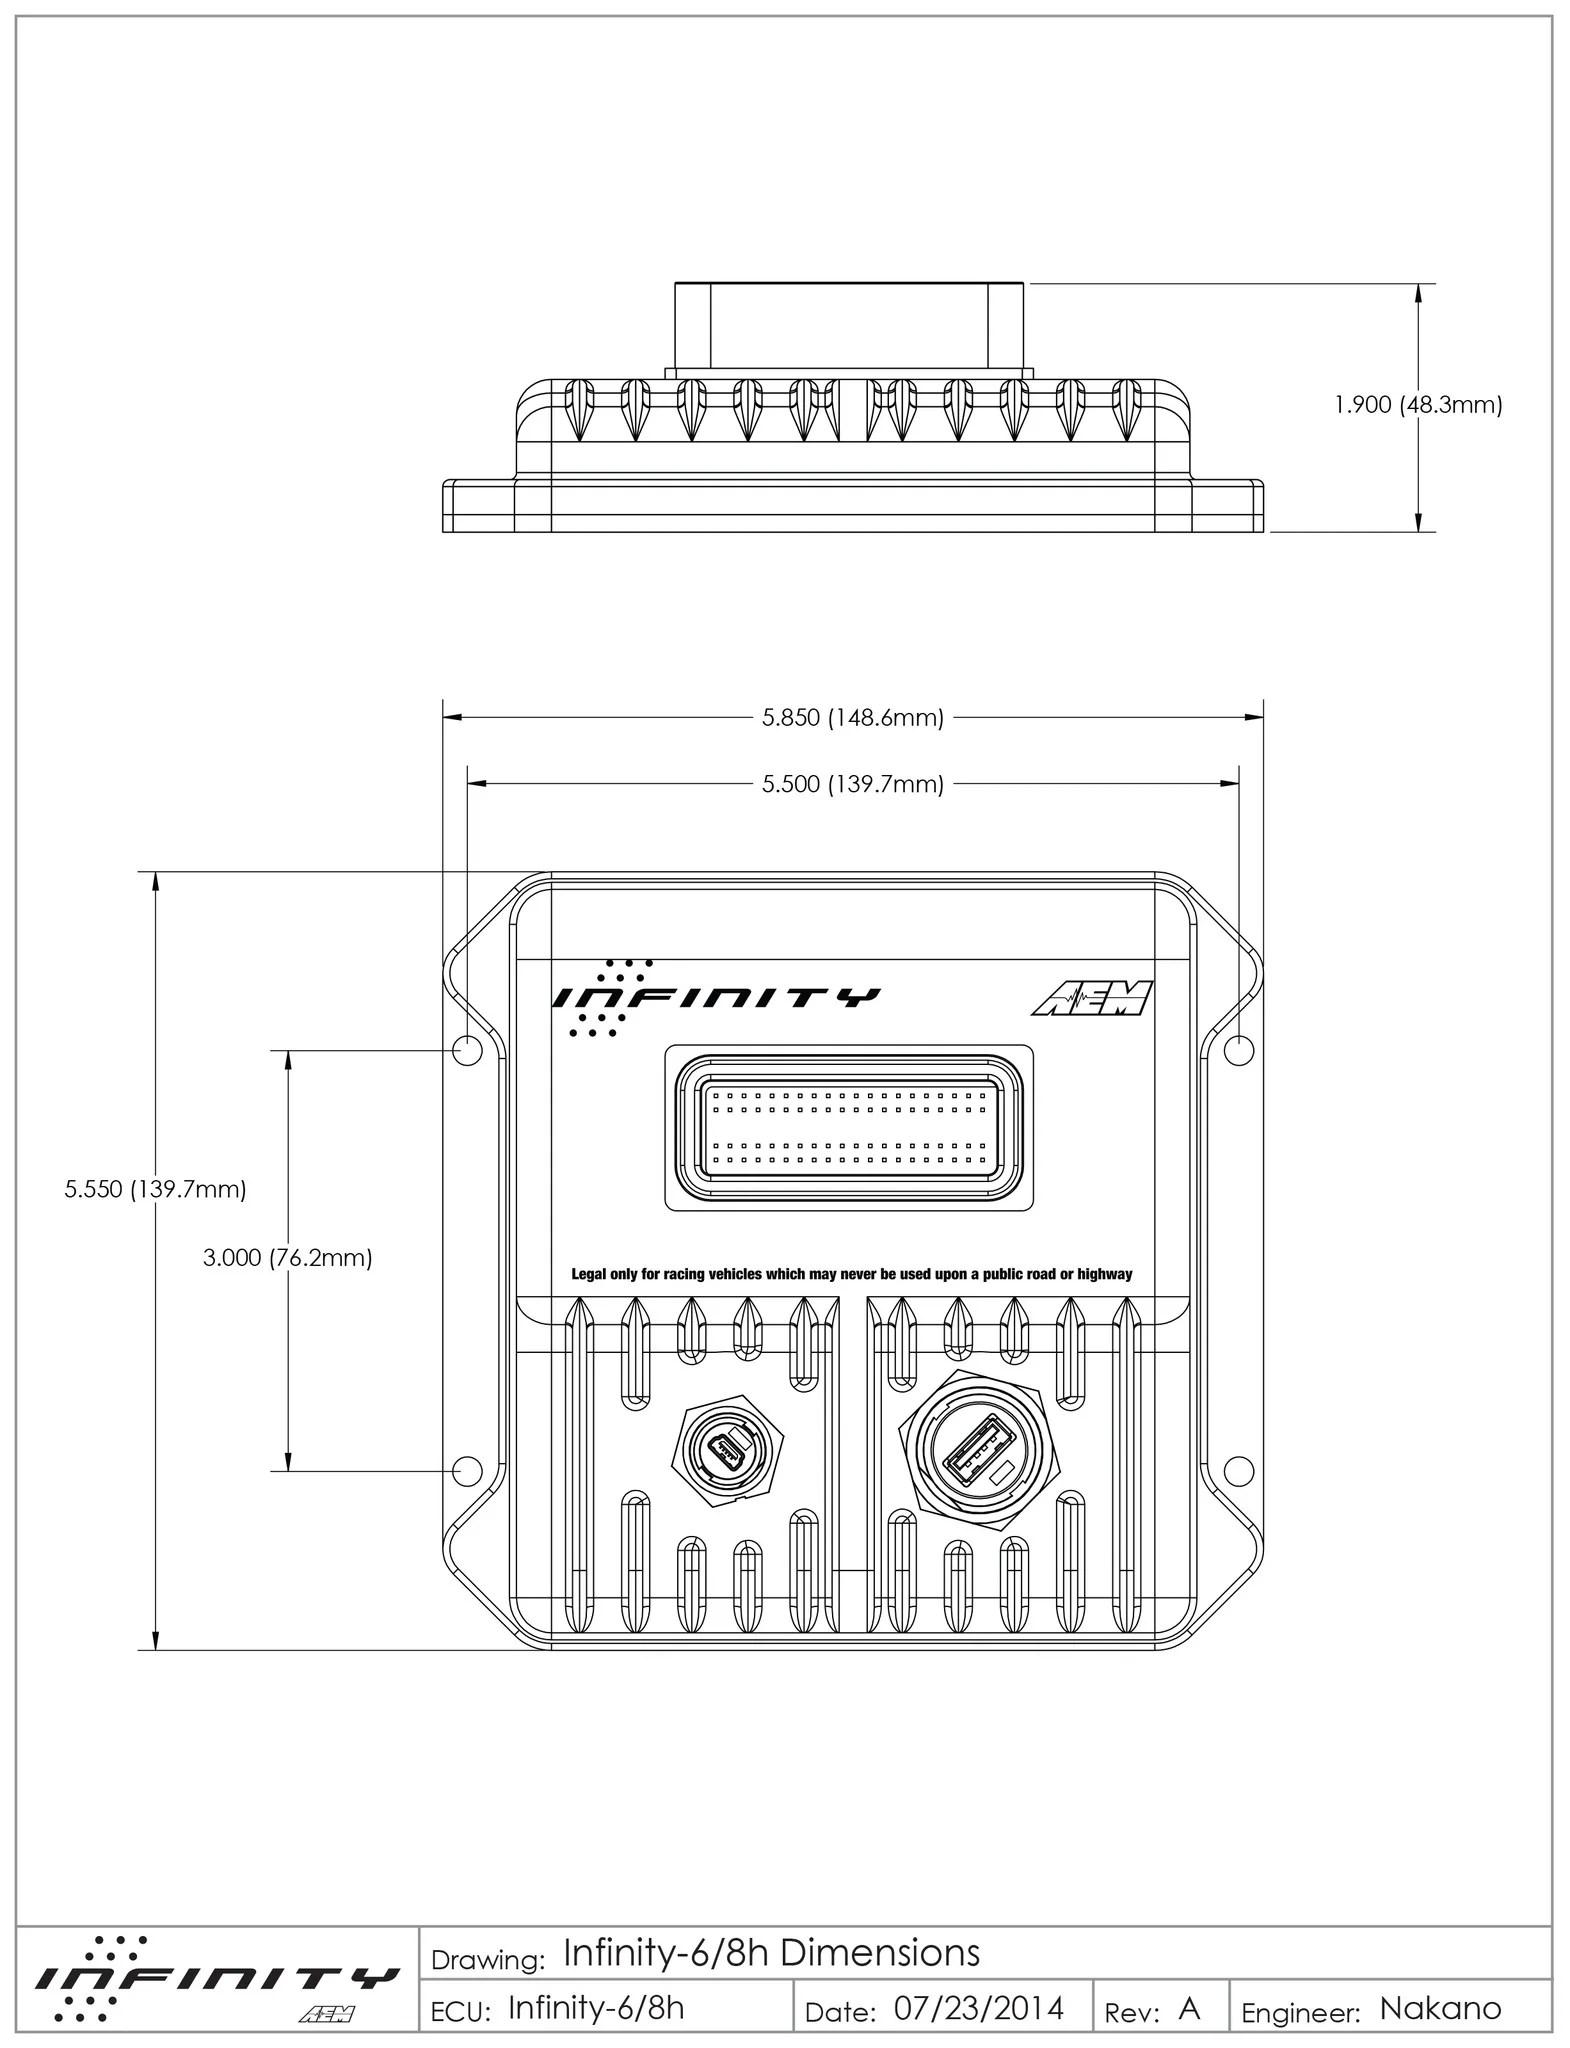 medium resolution of infinity 3 5 engine diagram simple wiring diagram impala 3 8 engine diagram 2002 nissan 3